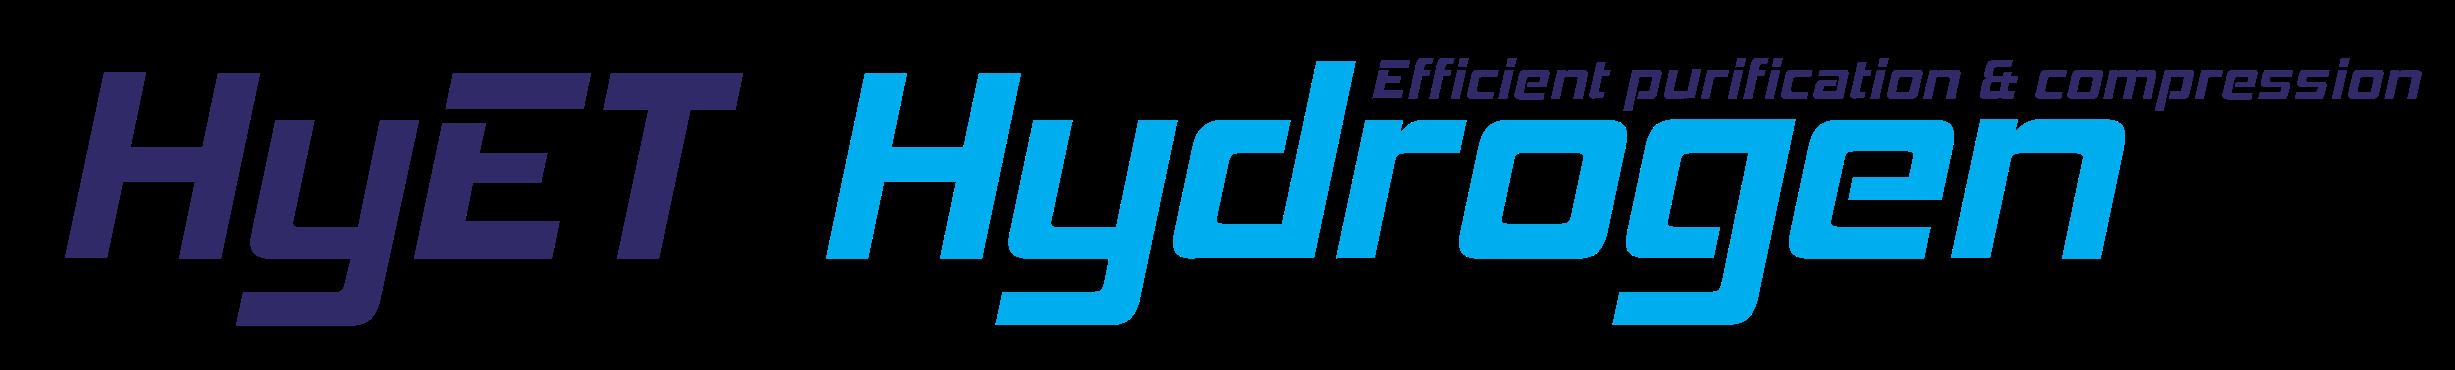 HyET Hydrogen